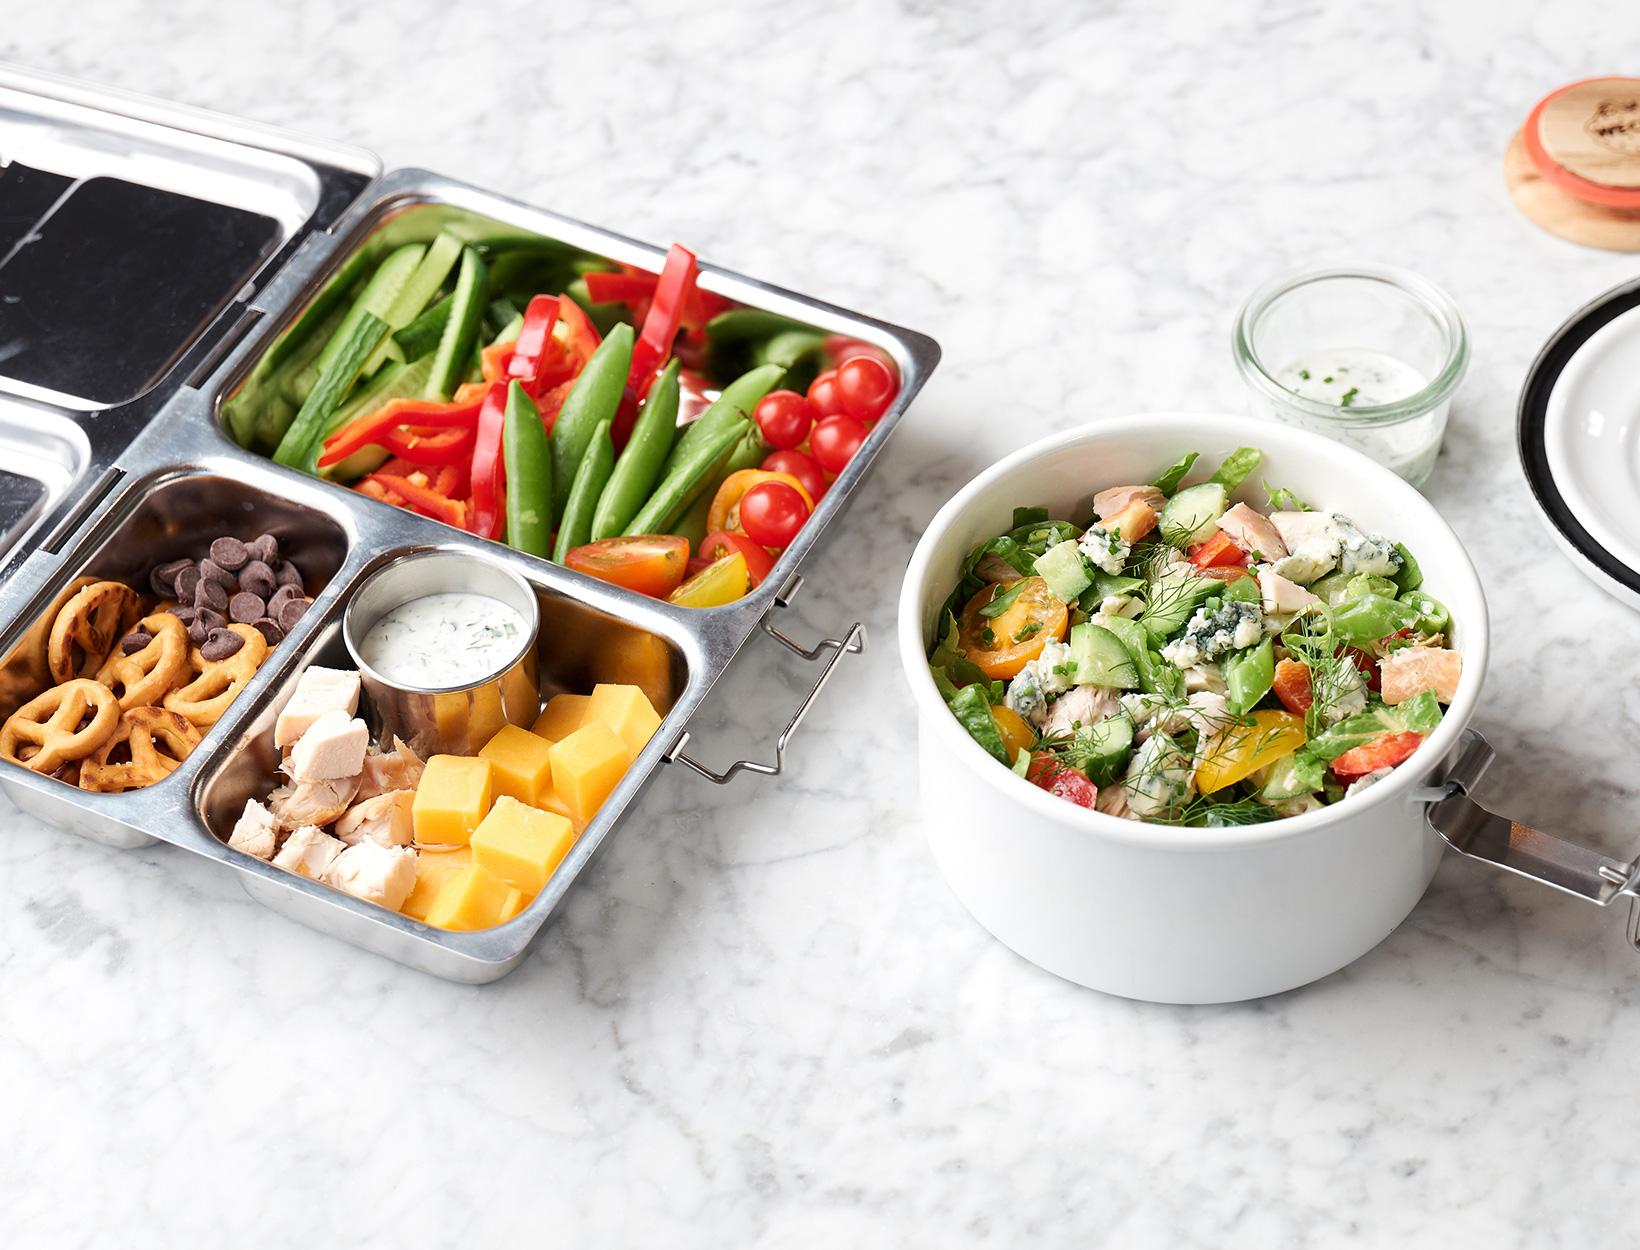 Double-Duty Chopped Salad